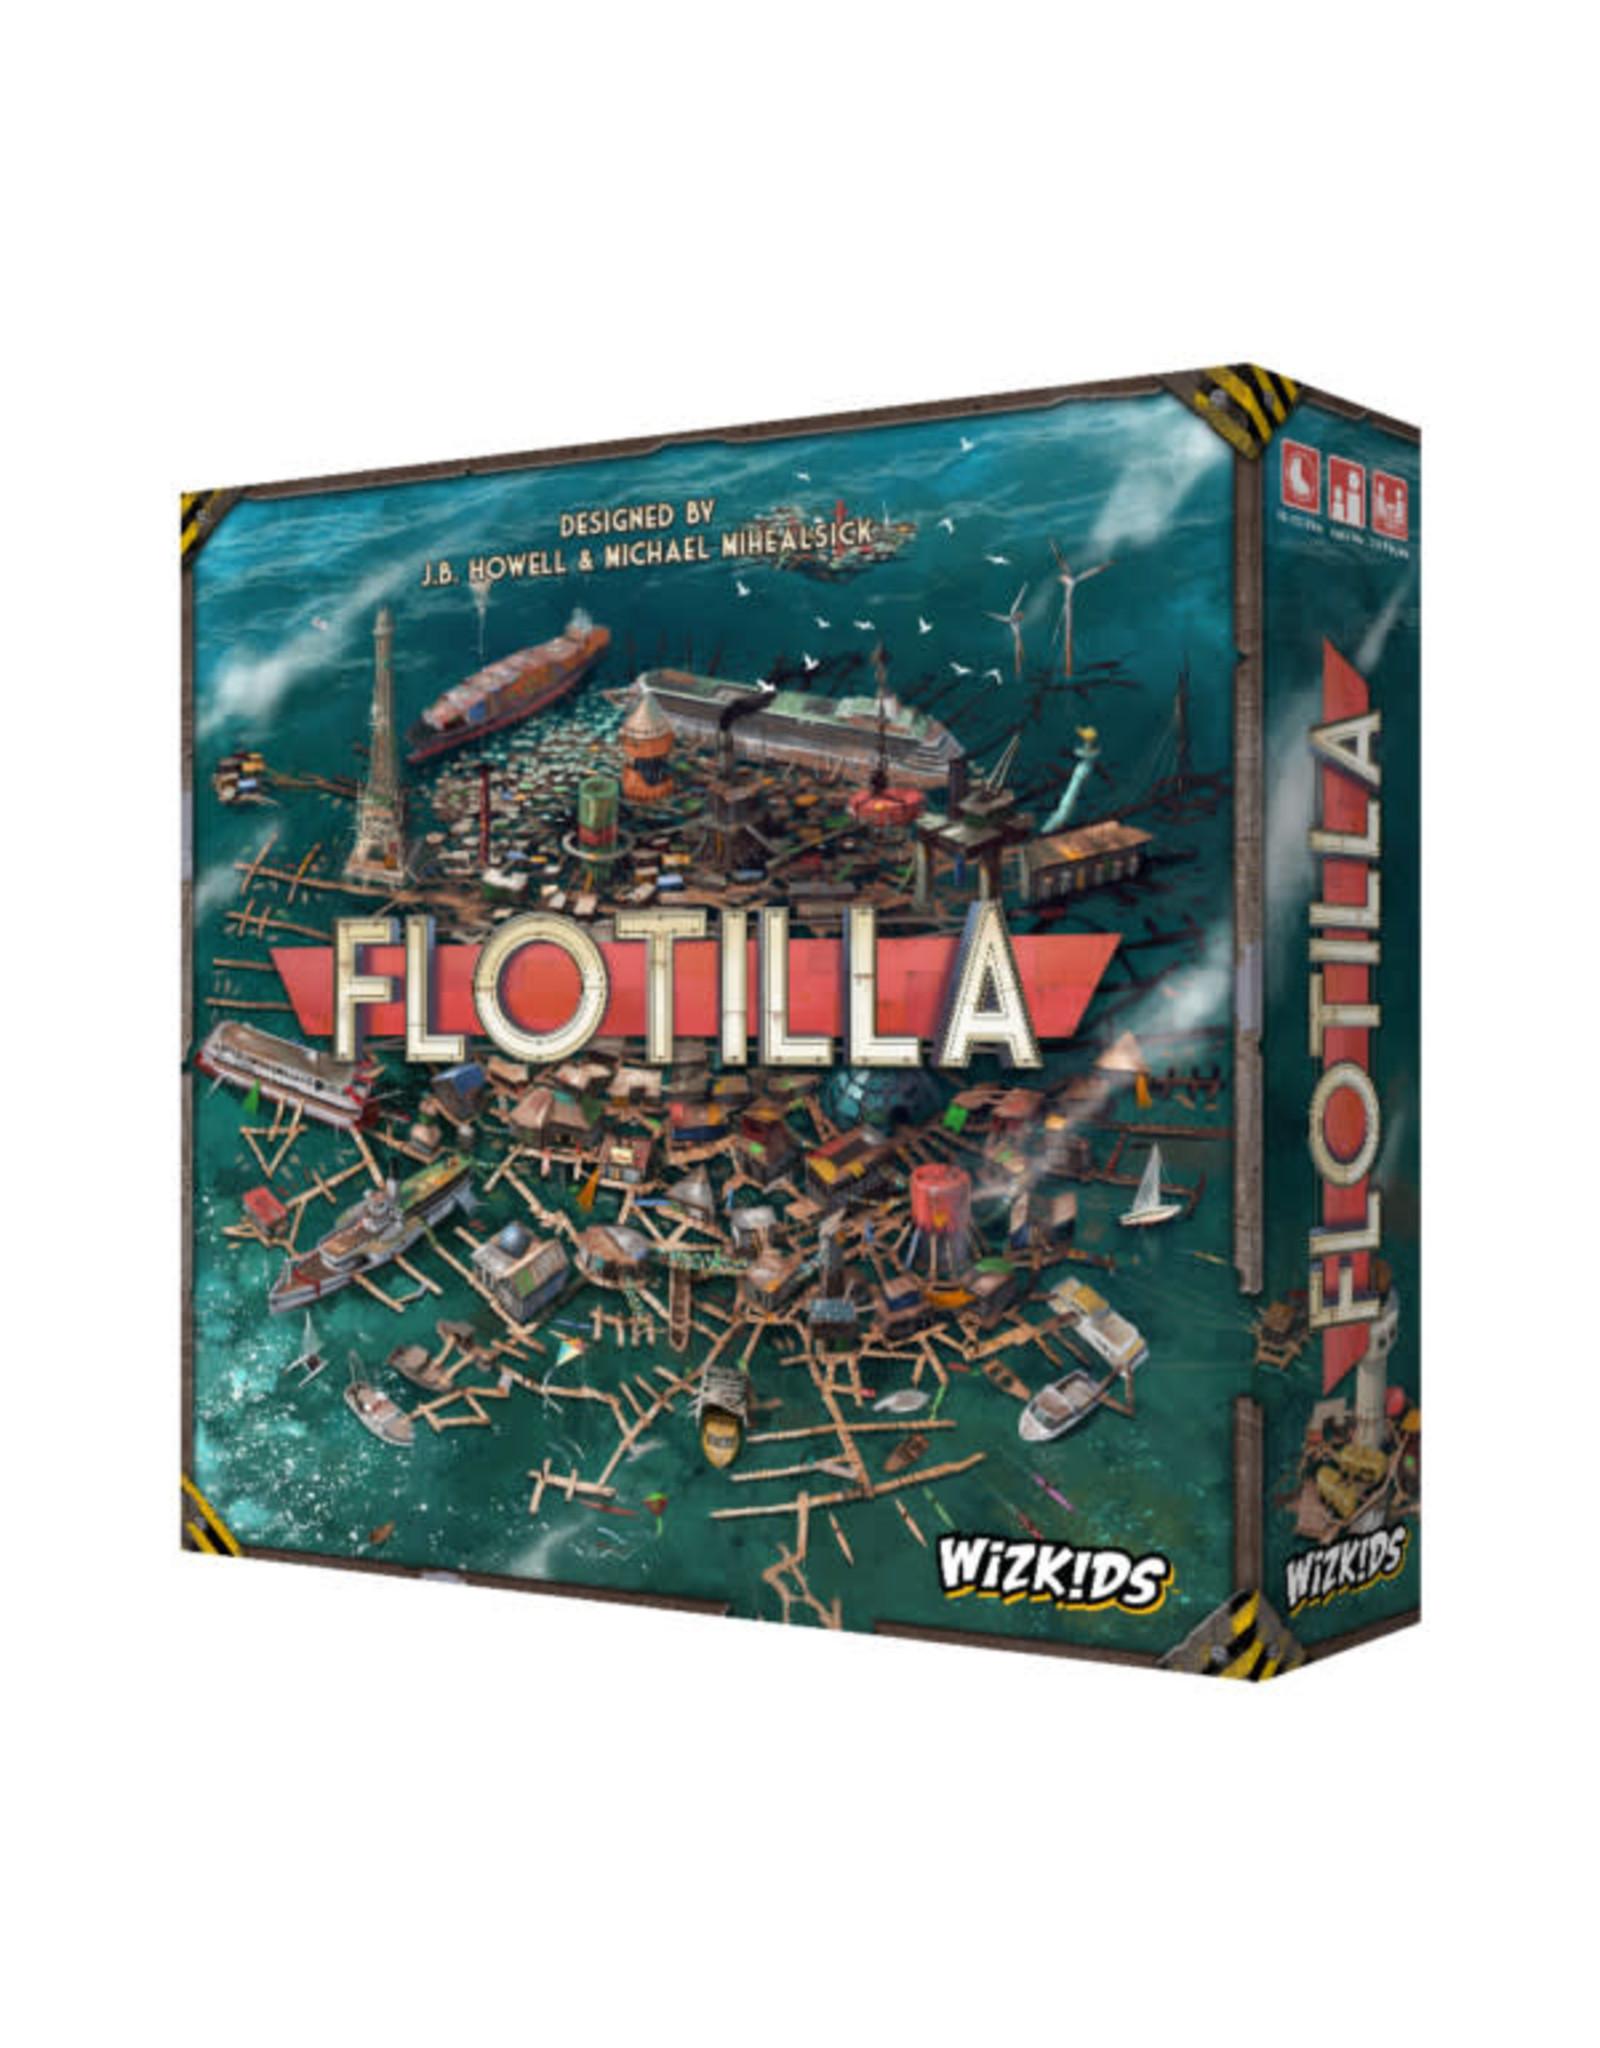 Wizkids Flotilla